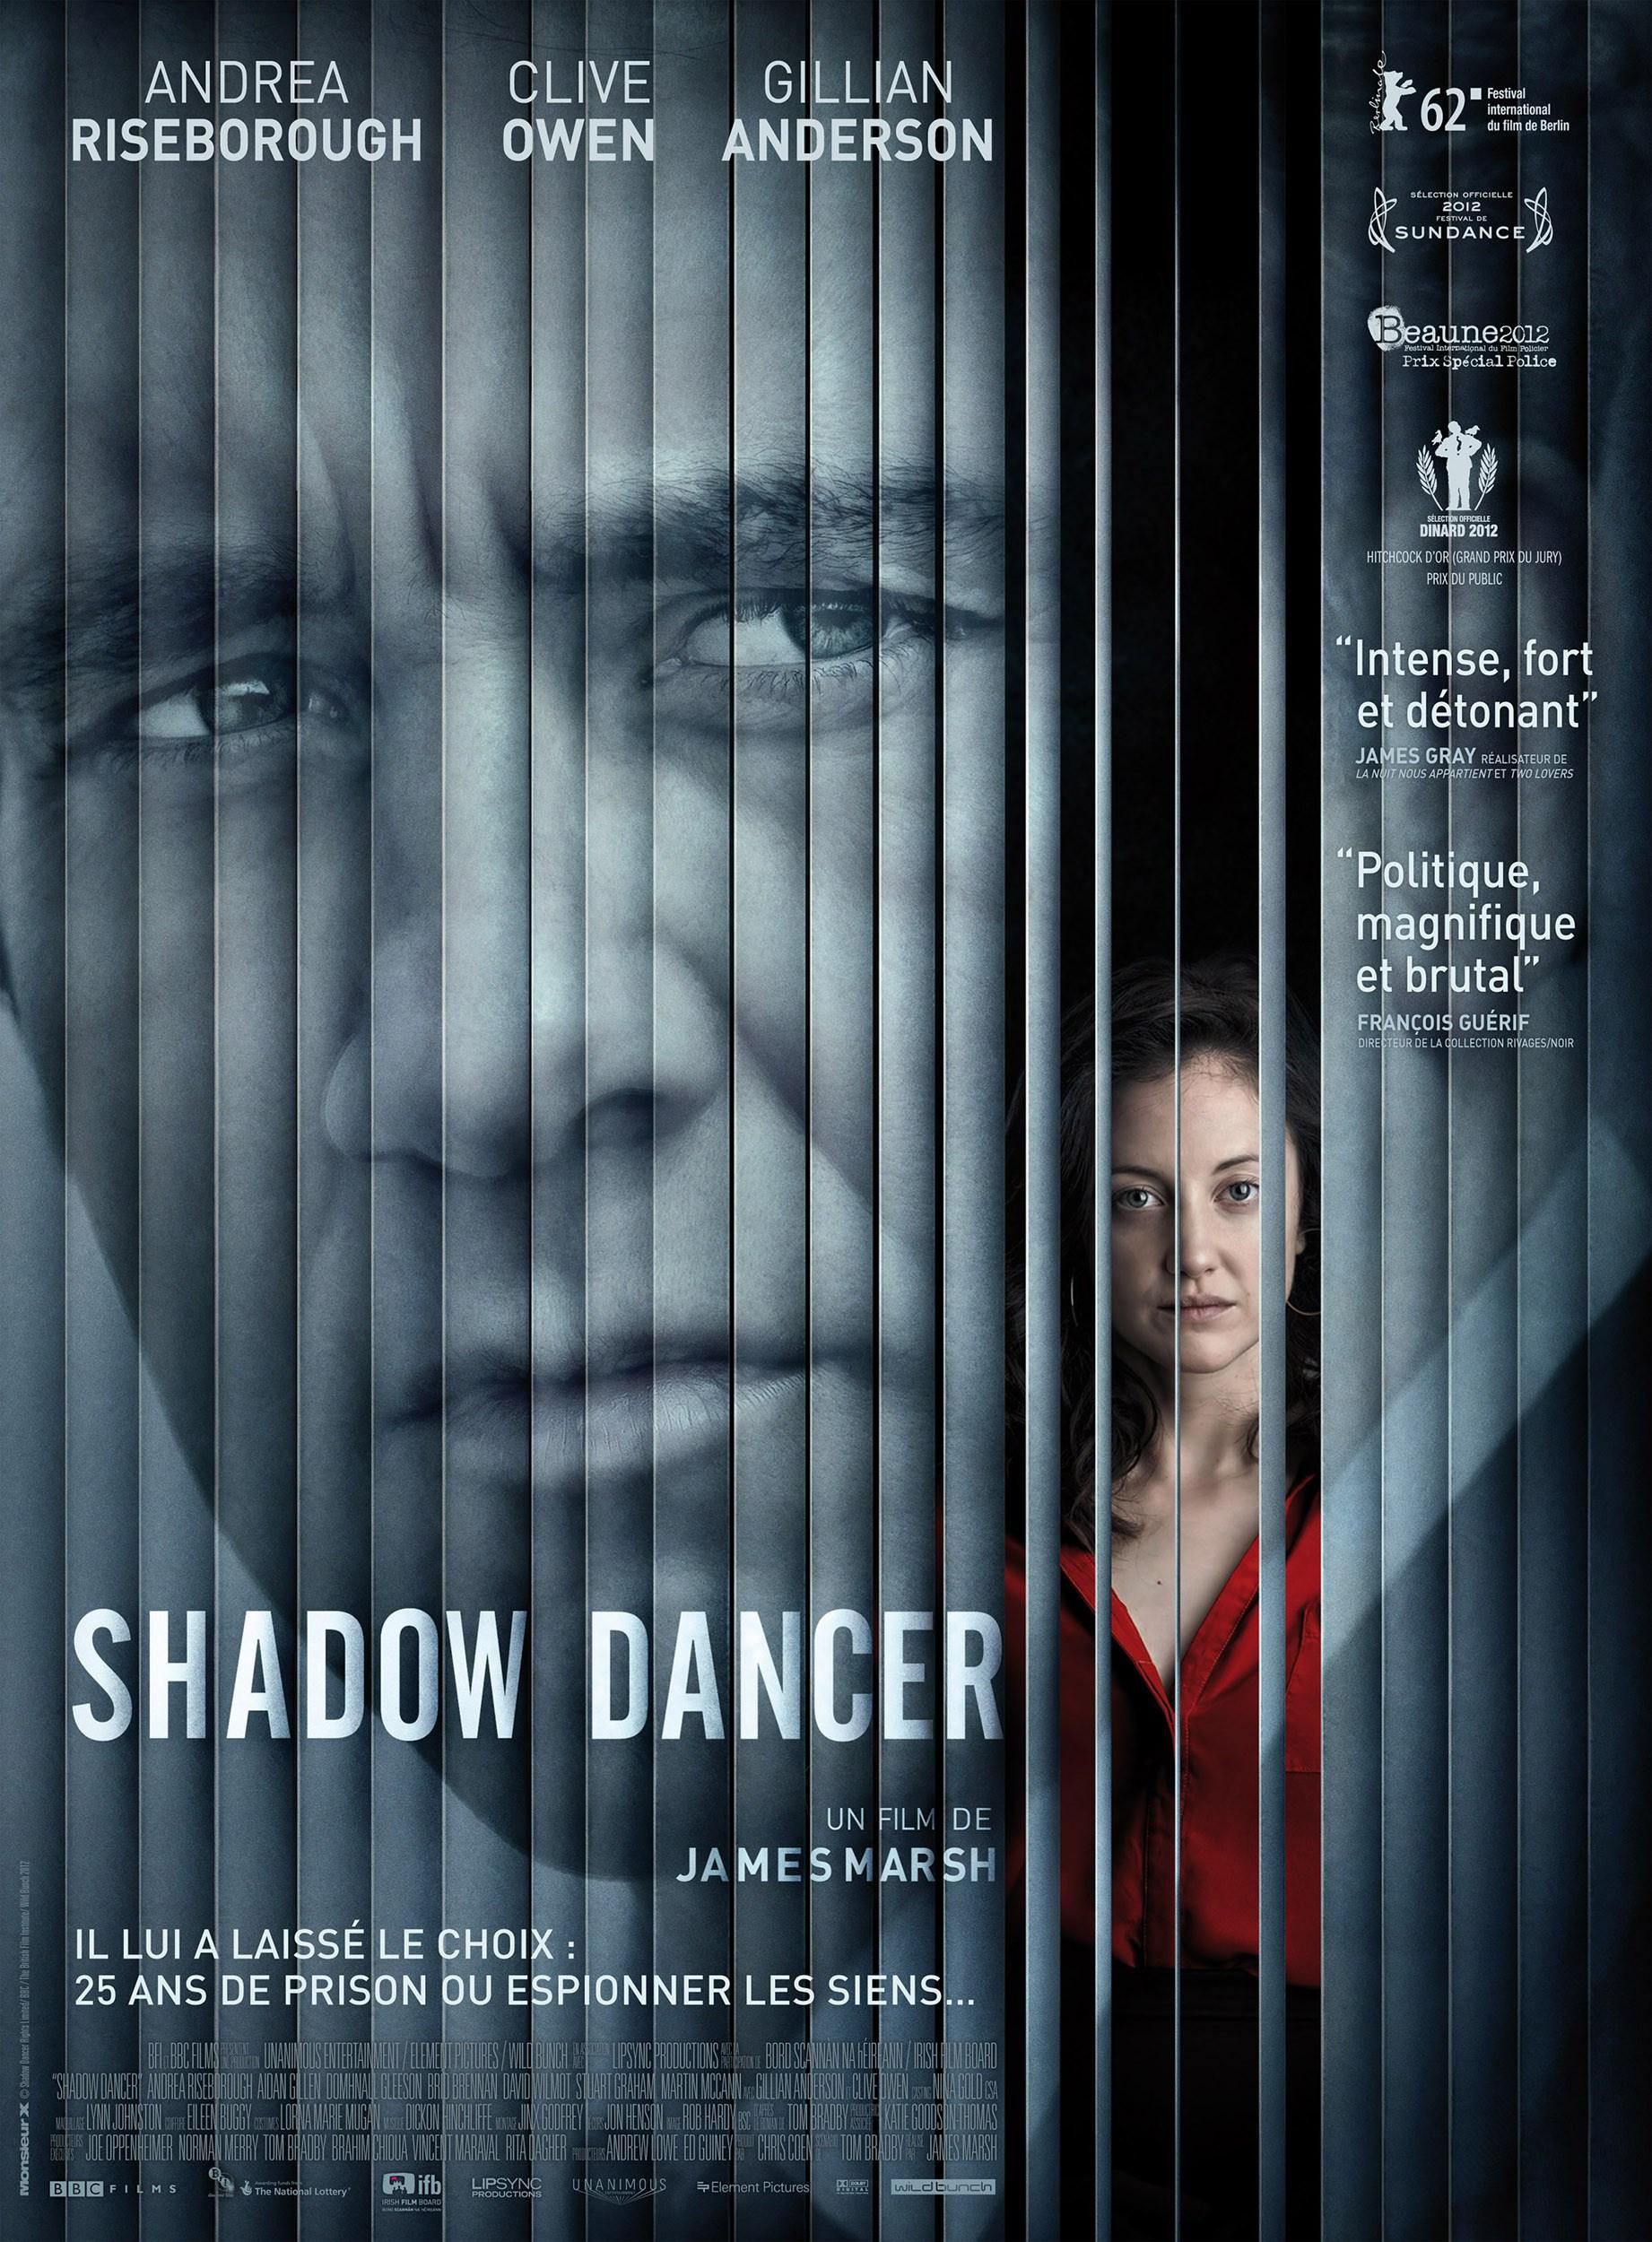 [critique] SHADOW DANCER